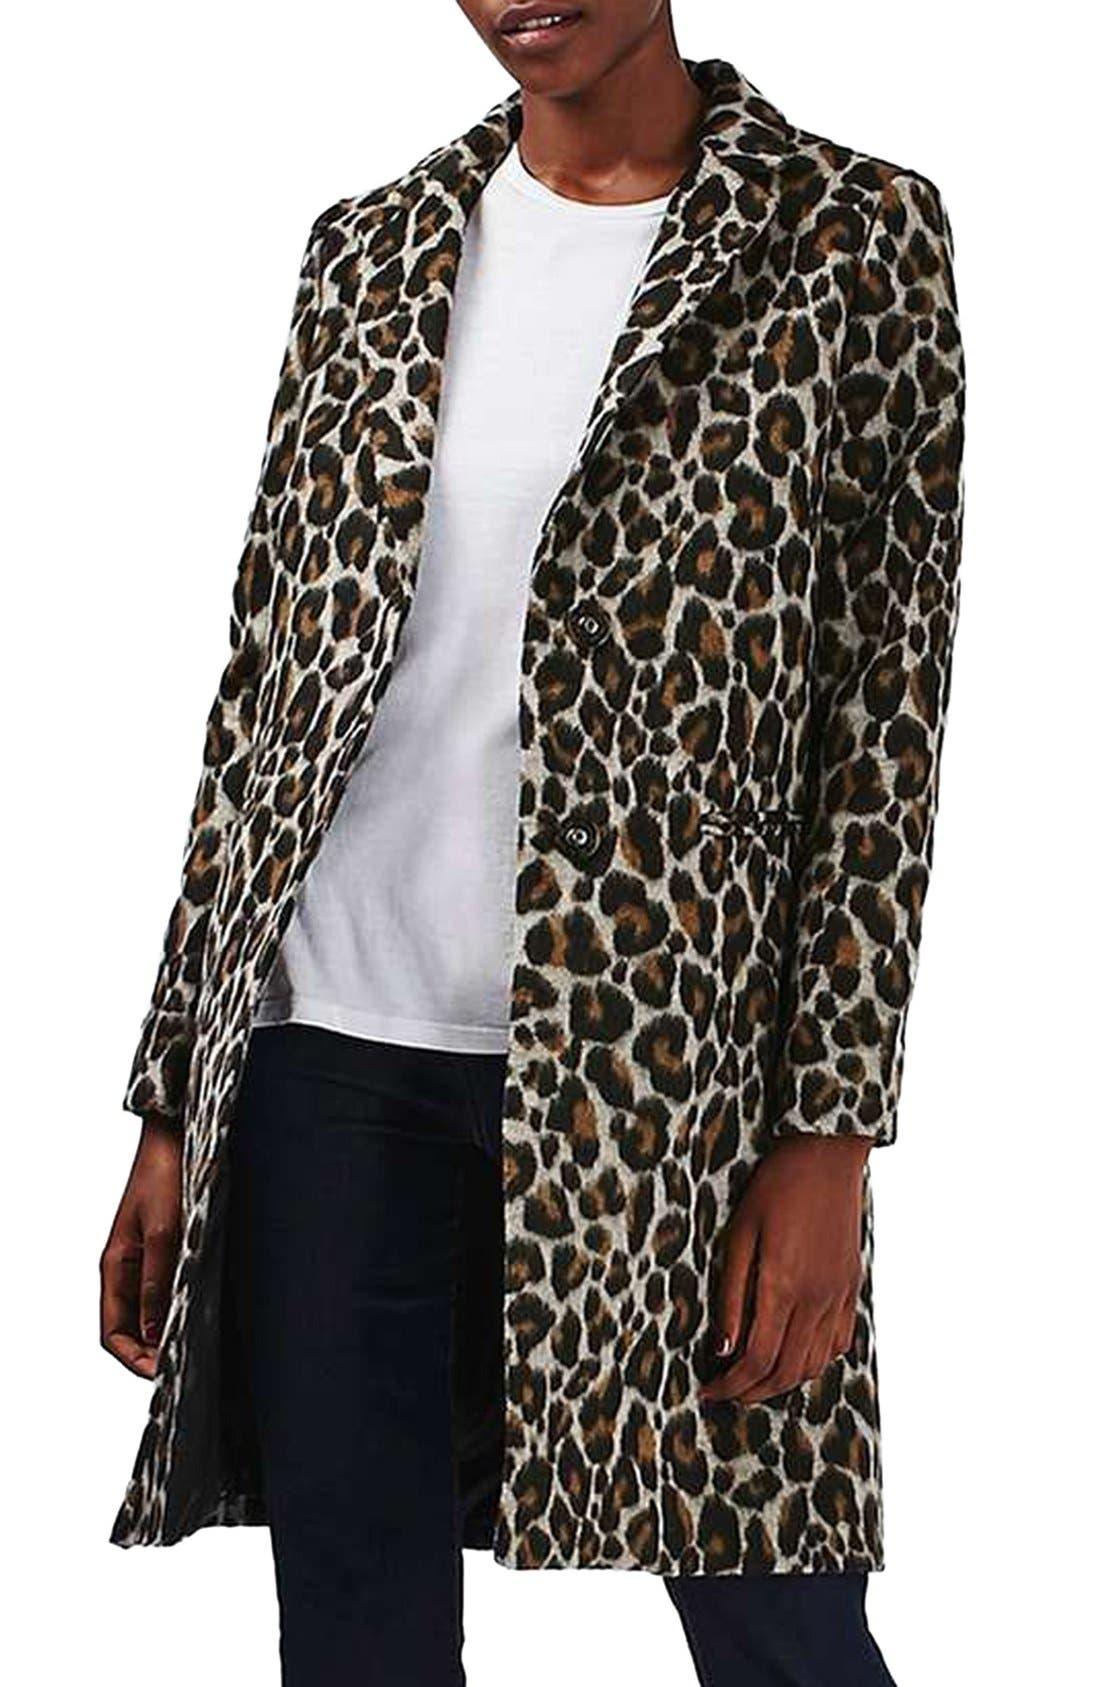 Alternate Image 1 Selected - Topshop Leopard Print Car Coat